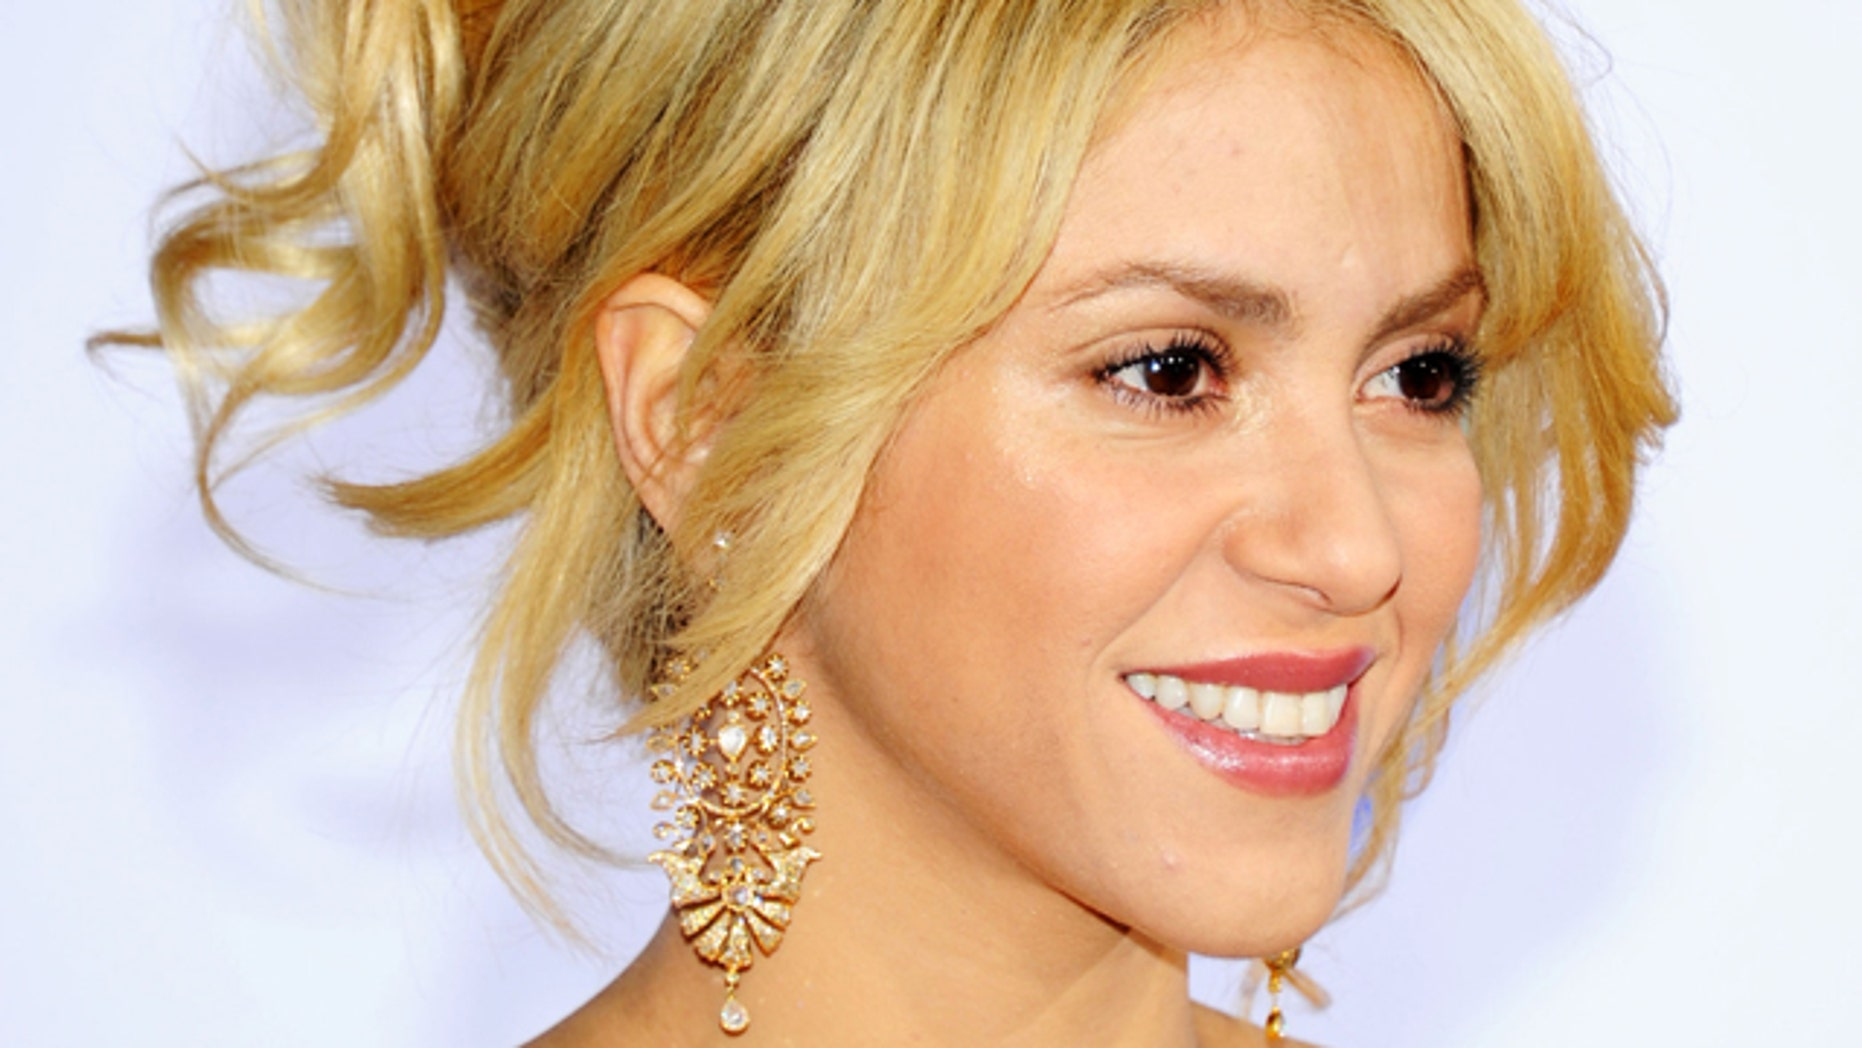 Nov. 10, 2011: Musician Shakira arrives at the 12th annual Latin GRAMMY Awards at the Mandalay Bay Resort & Casino in Las Vegas, Nev.